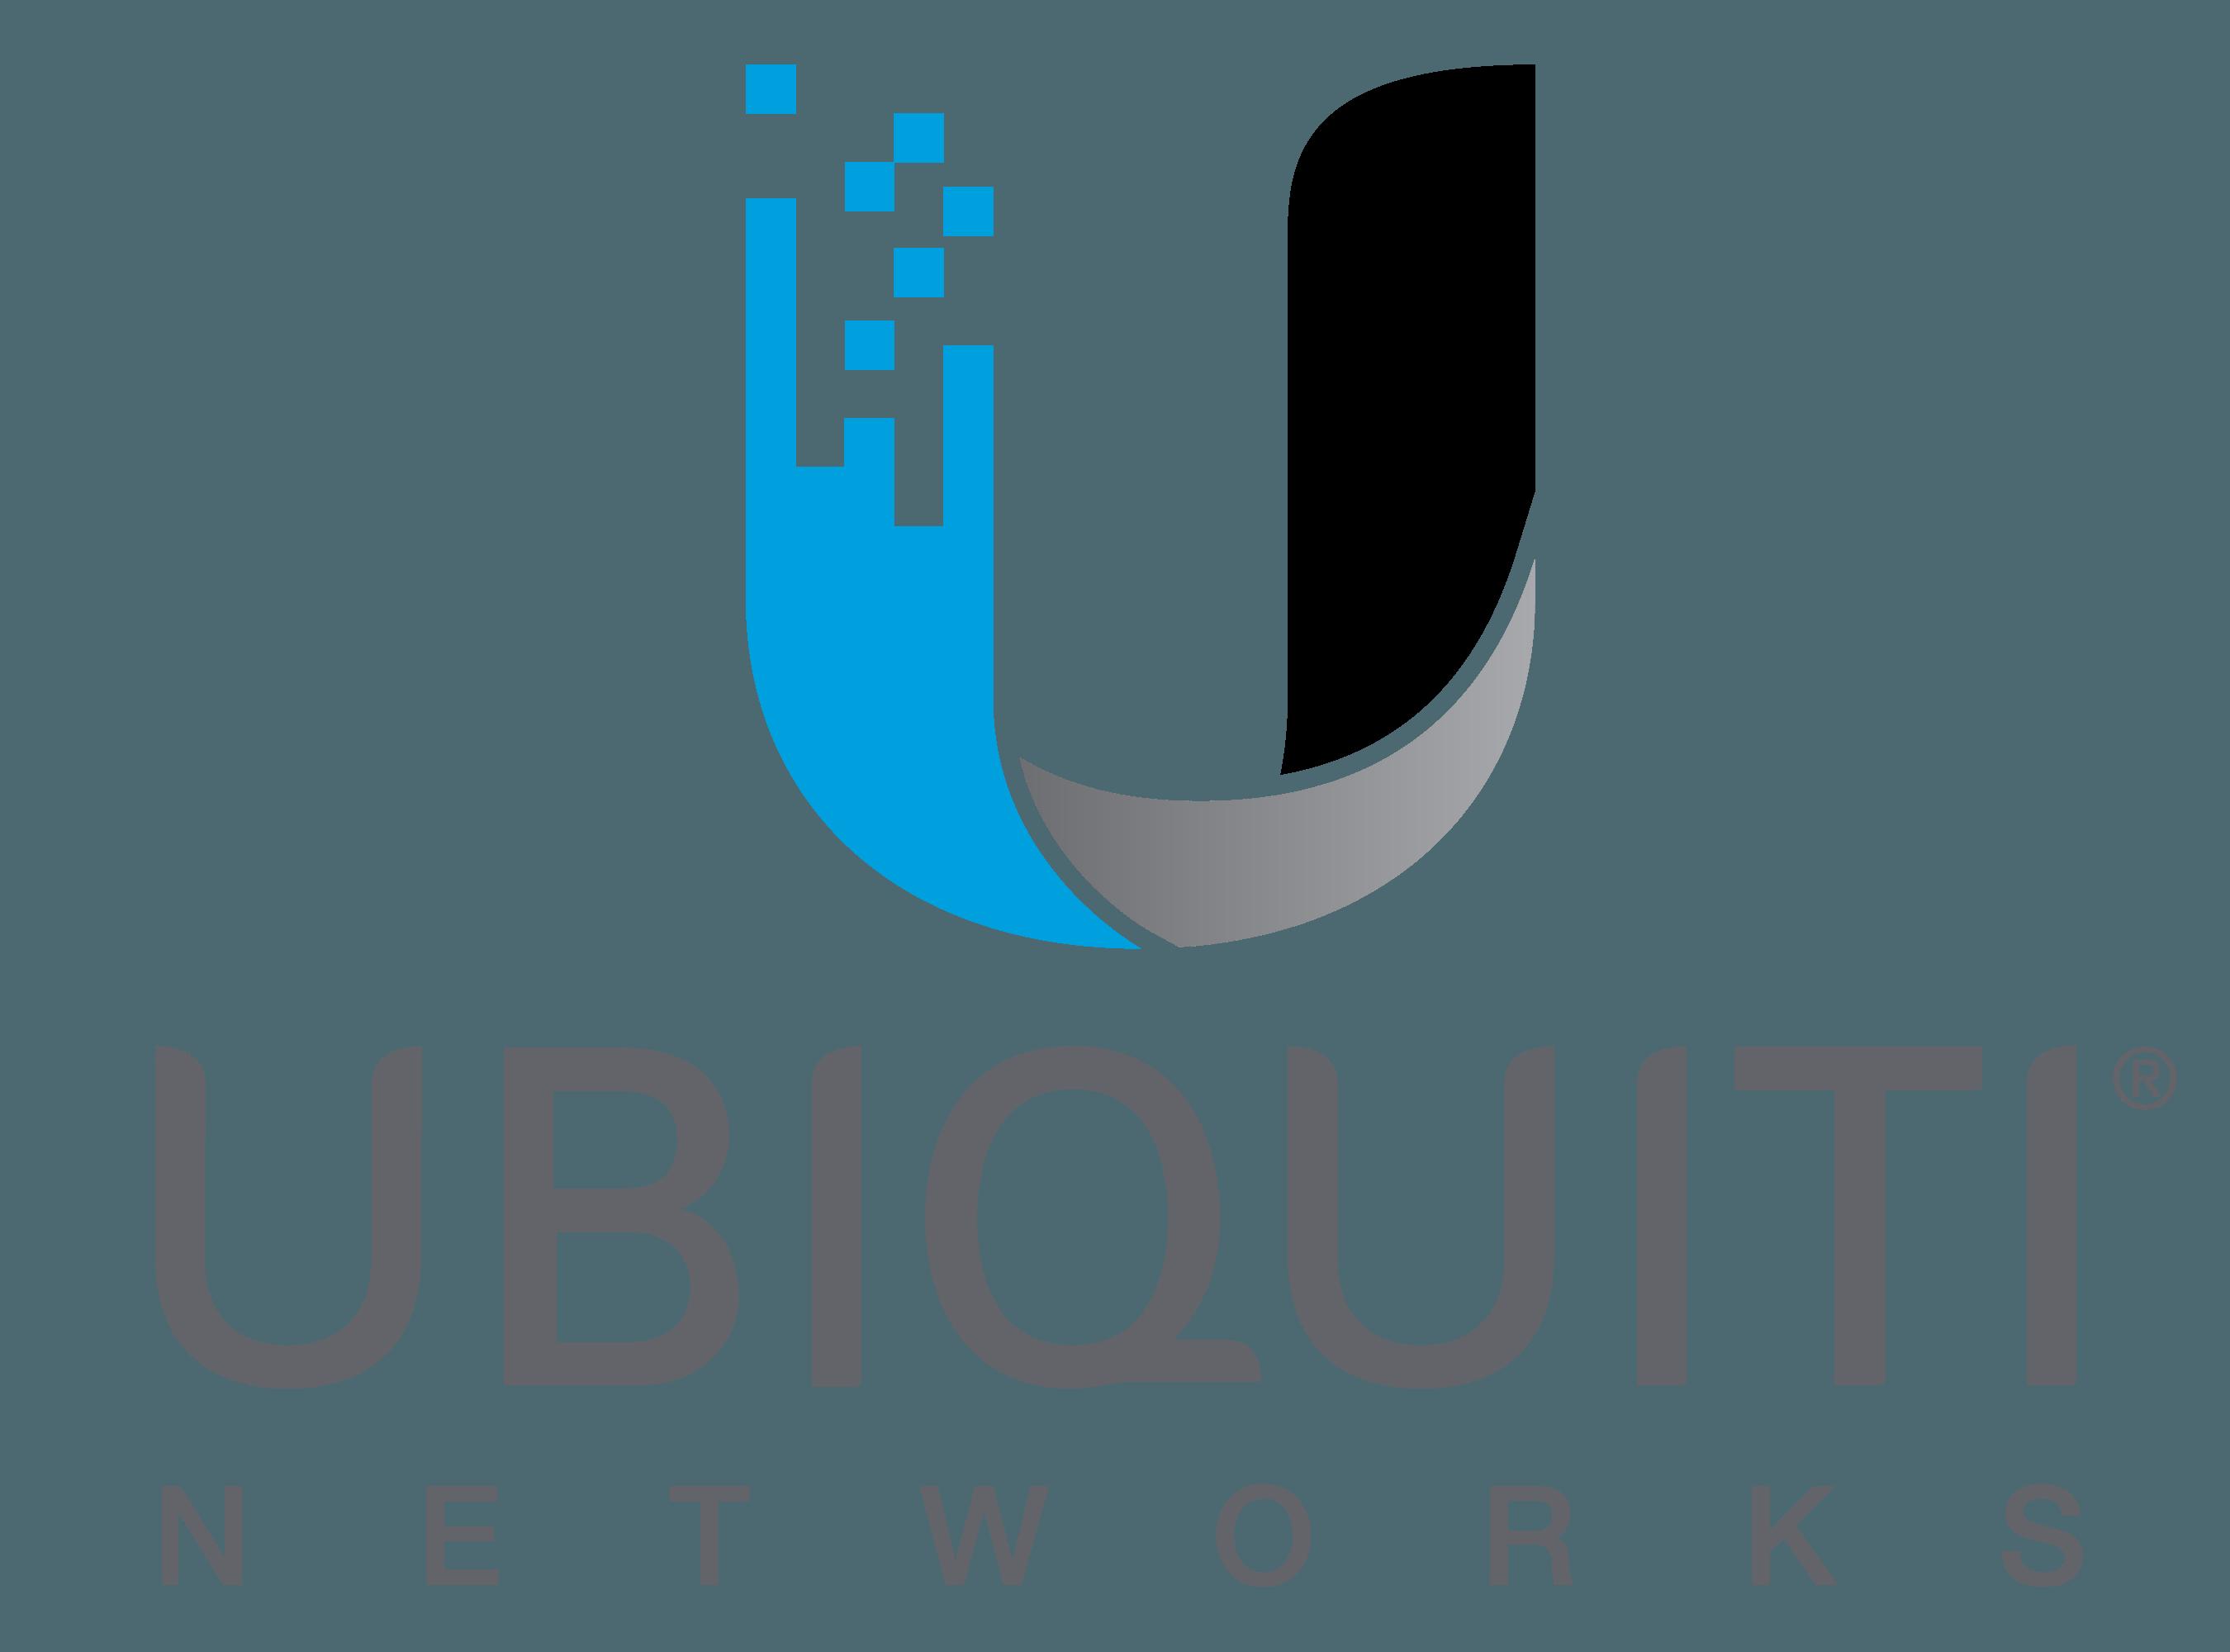 ubnt_logo_2700x2000